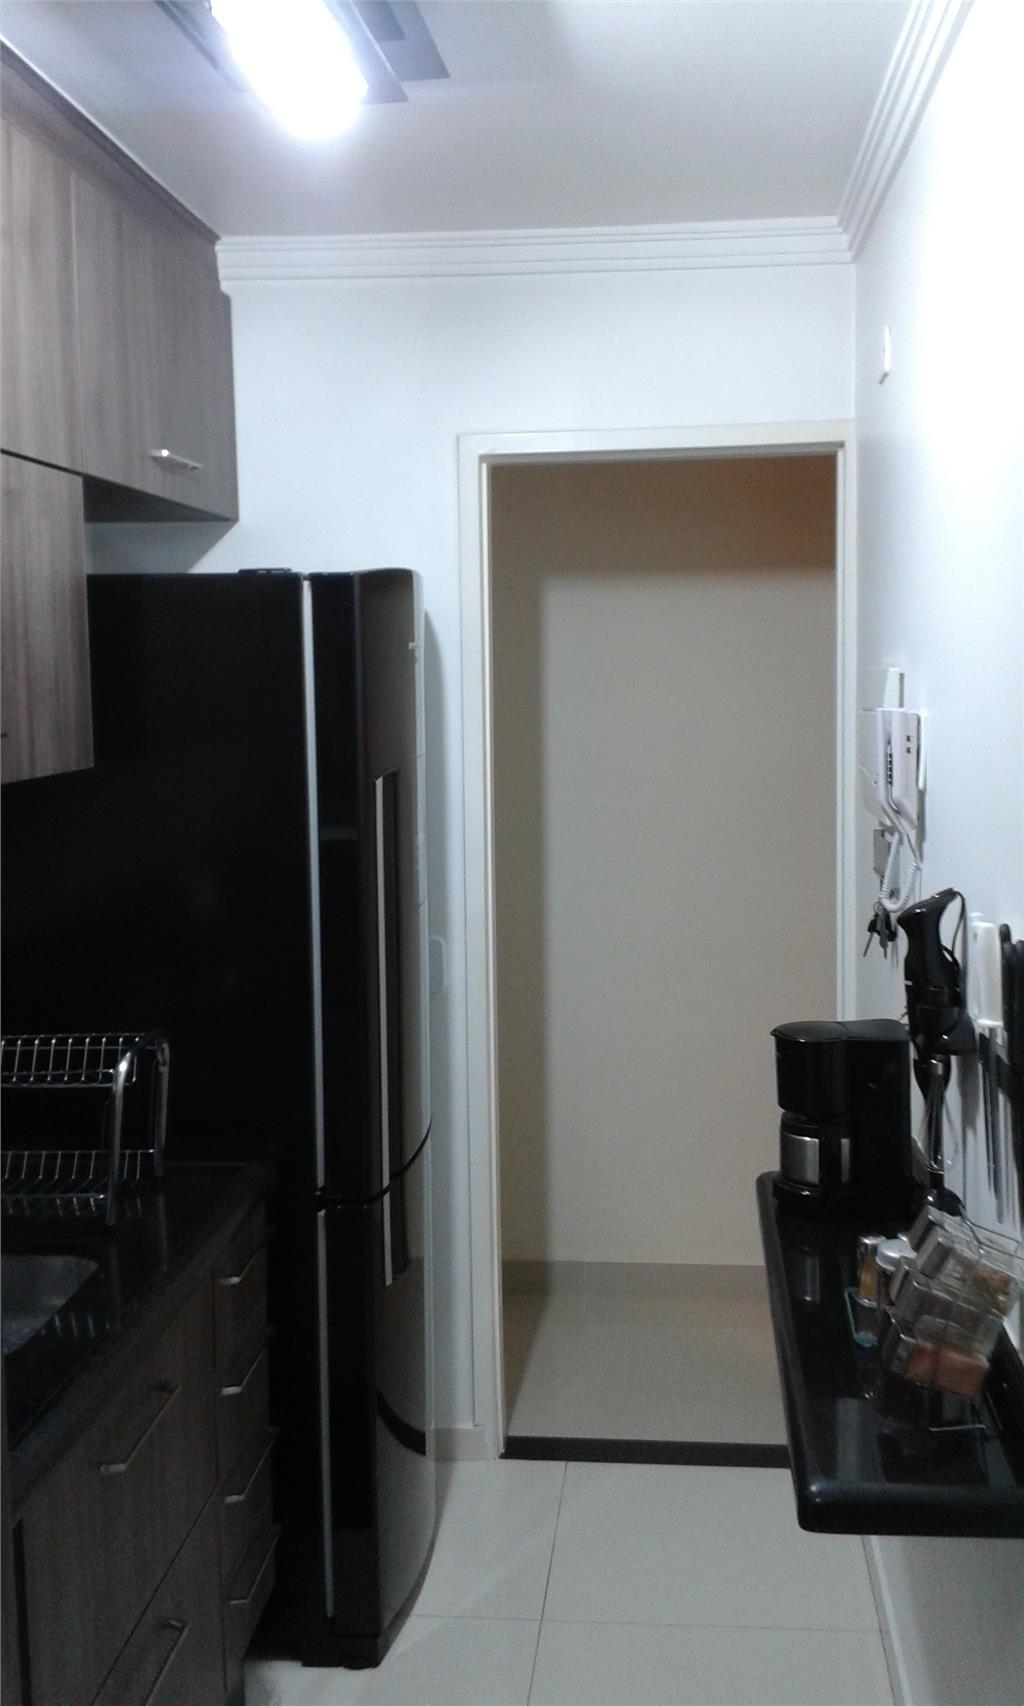 Soute Imóveis - Apto 2 Dorm, Guarulhos (AP2610) - Foto 7